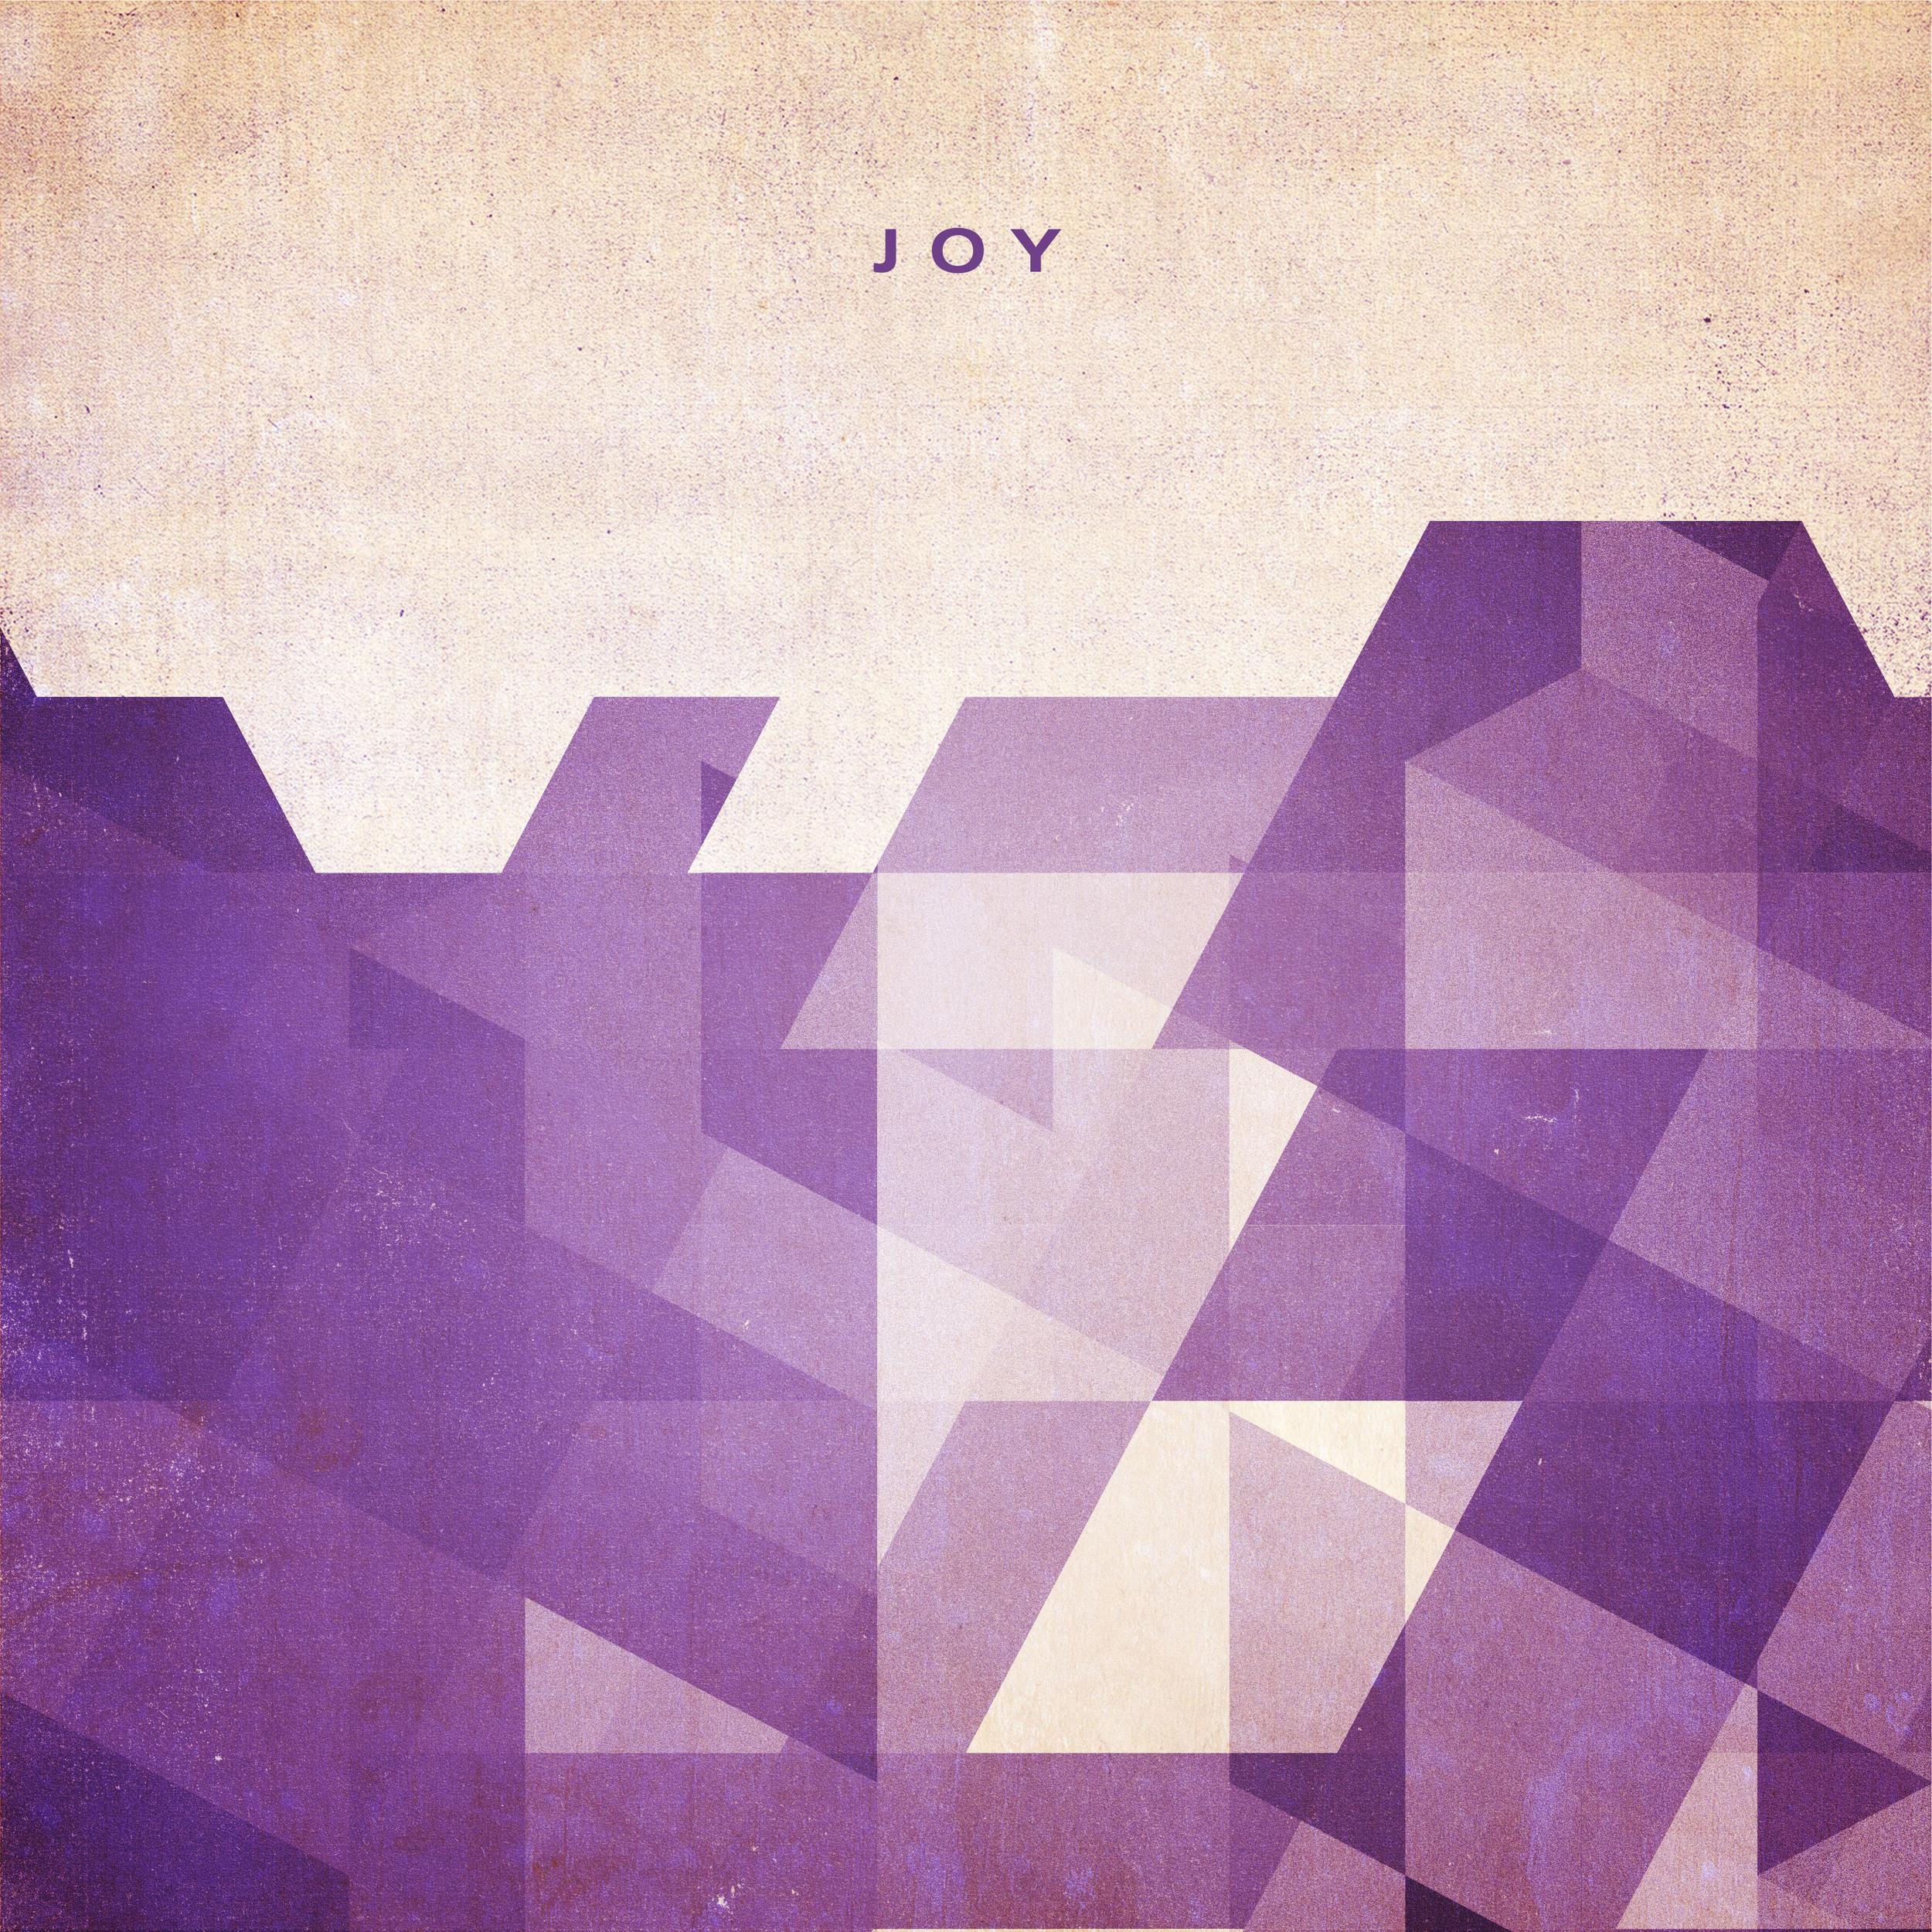 Fruit-of-the-Spirit__0001_2-Joy.jpg